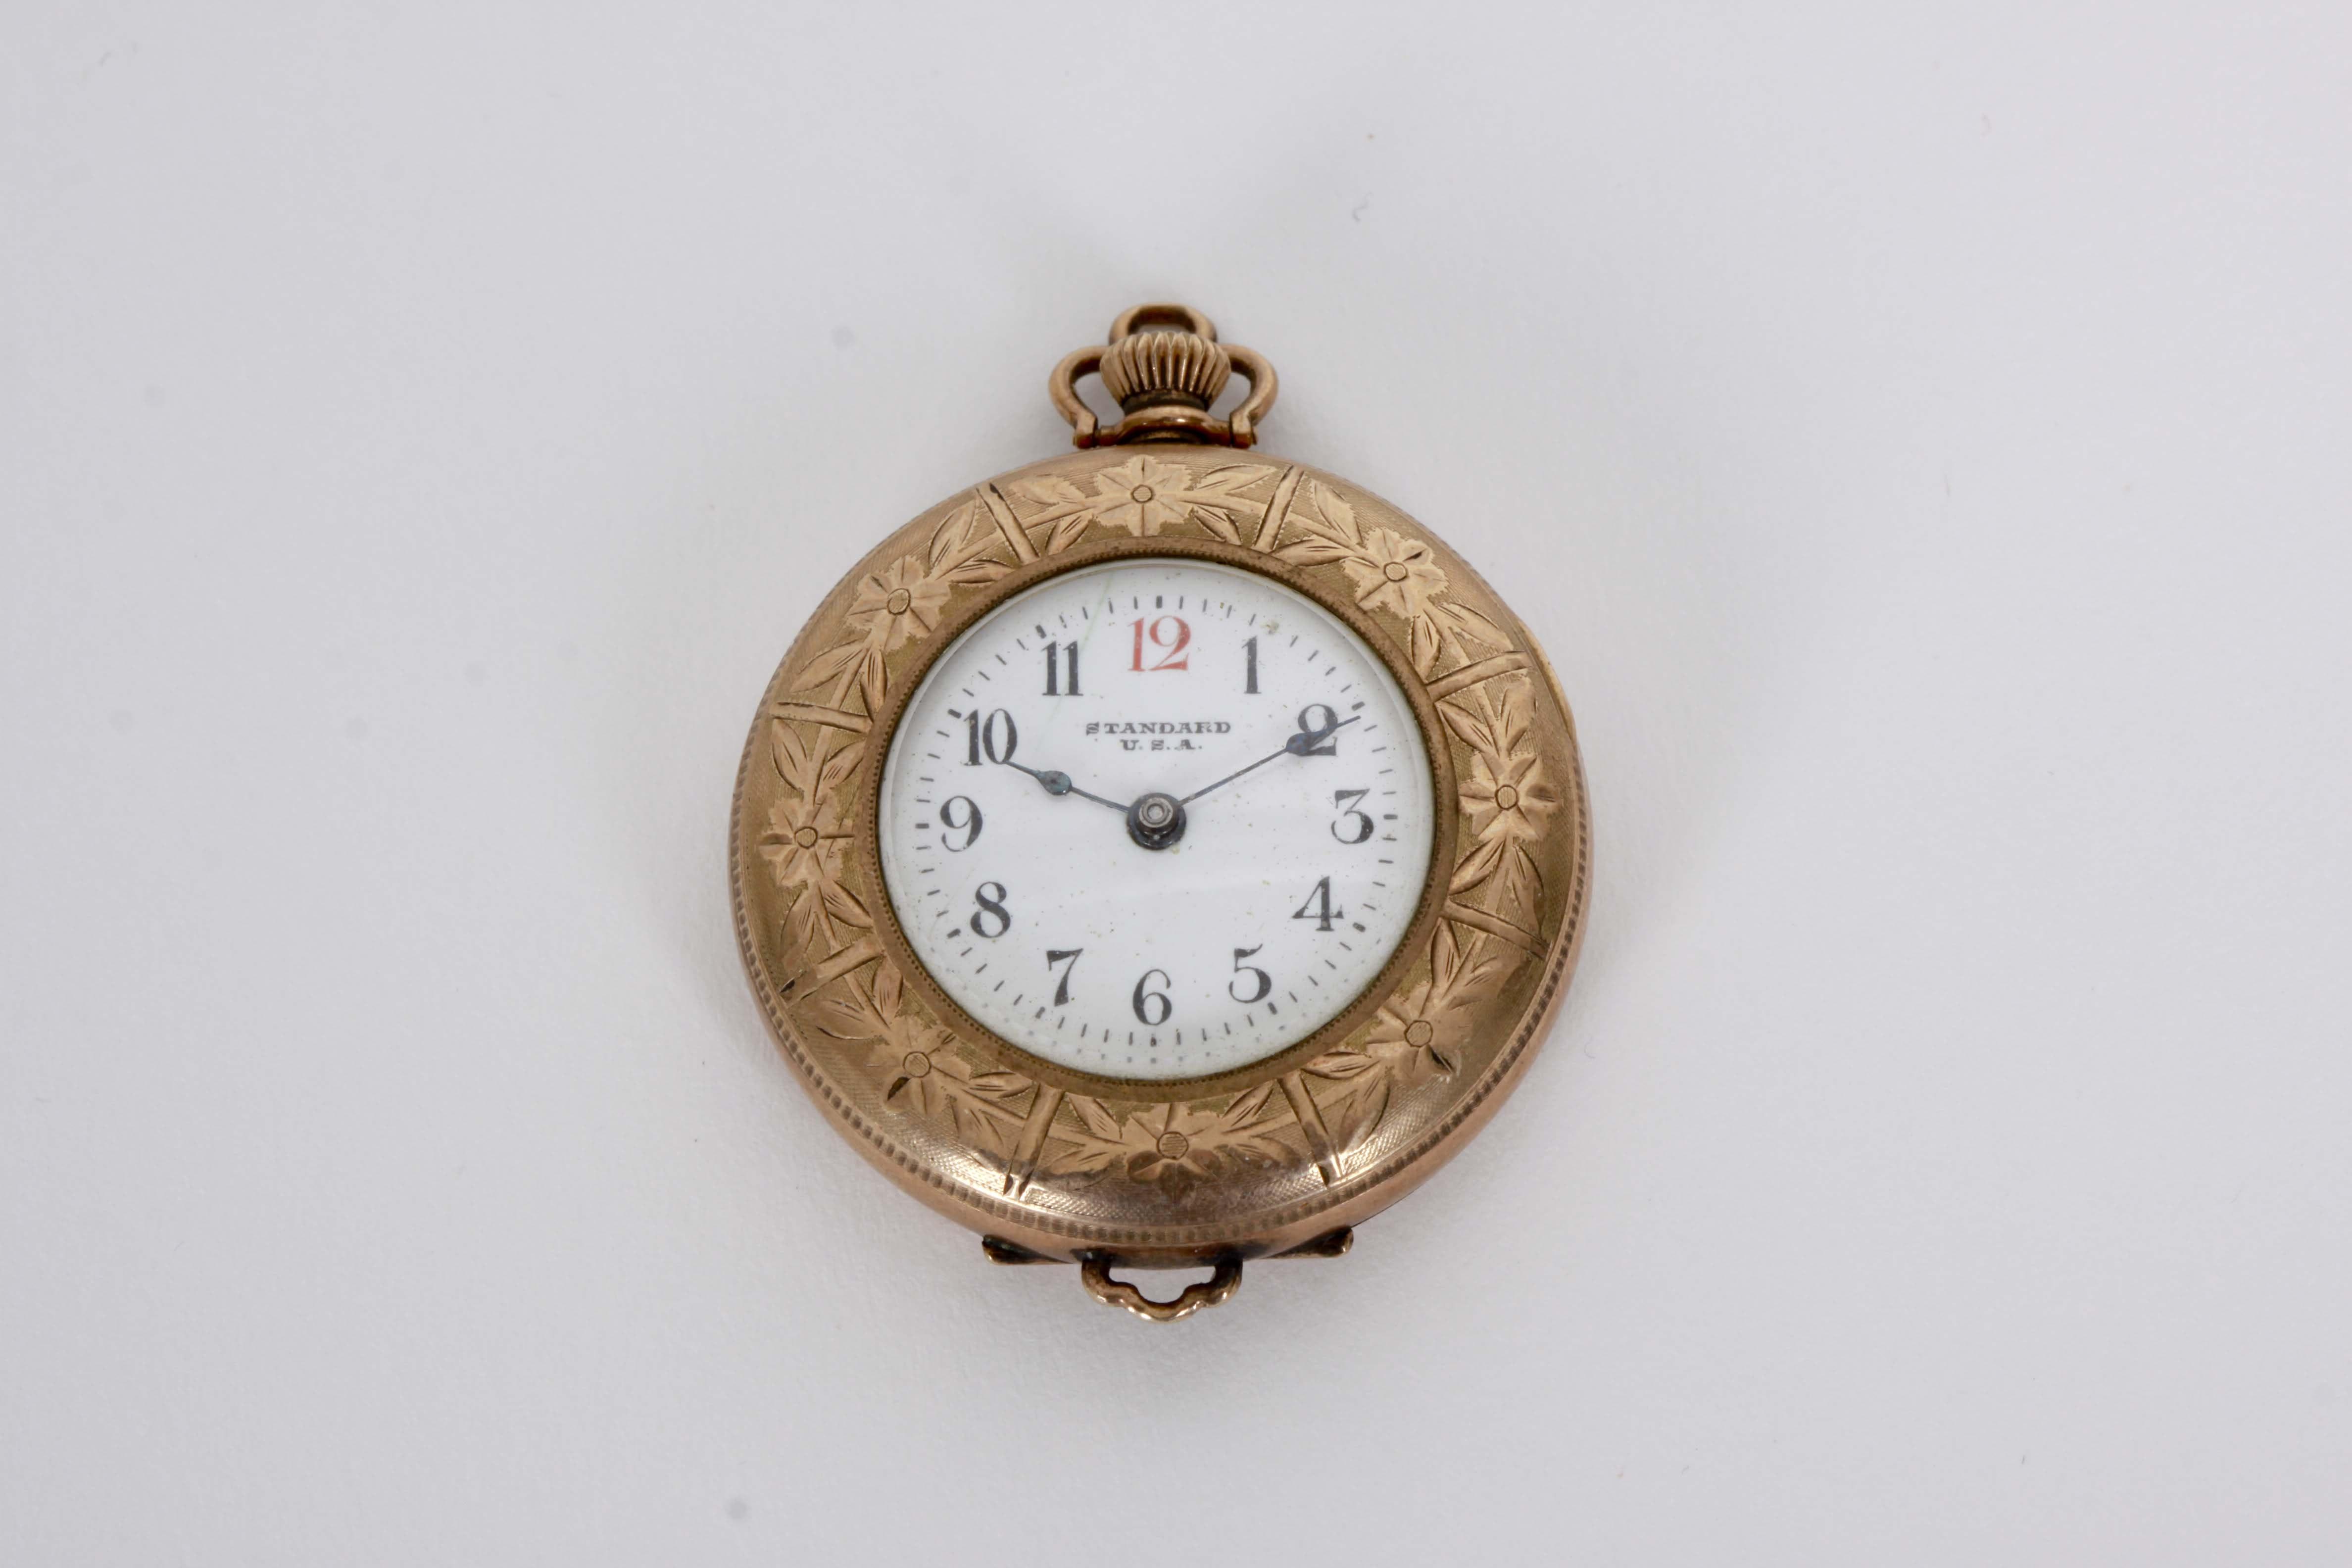 A Standard Gold Filled Pocketwatch